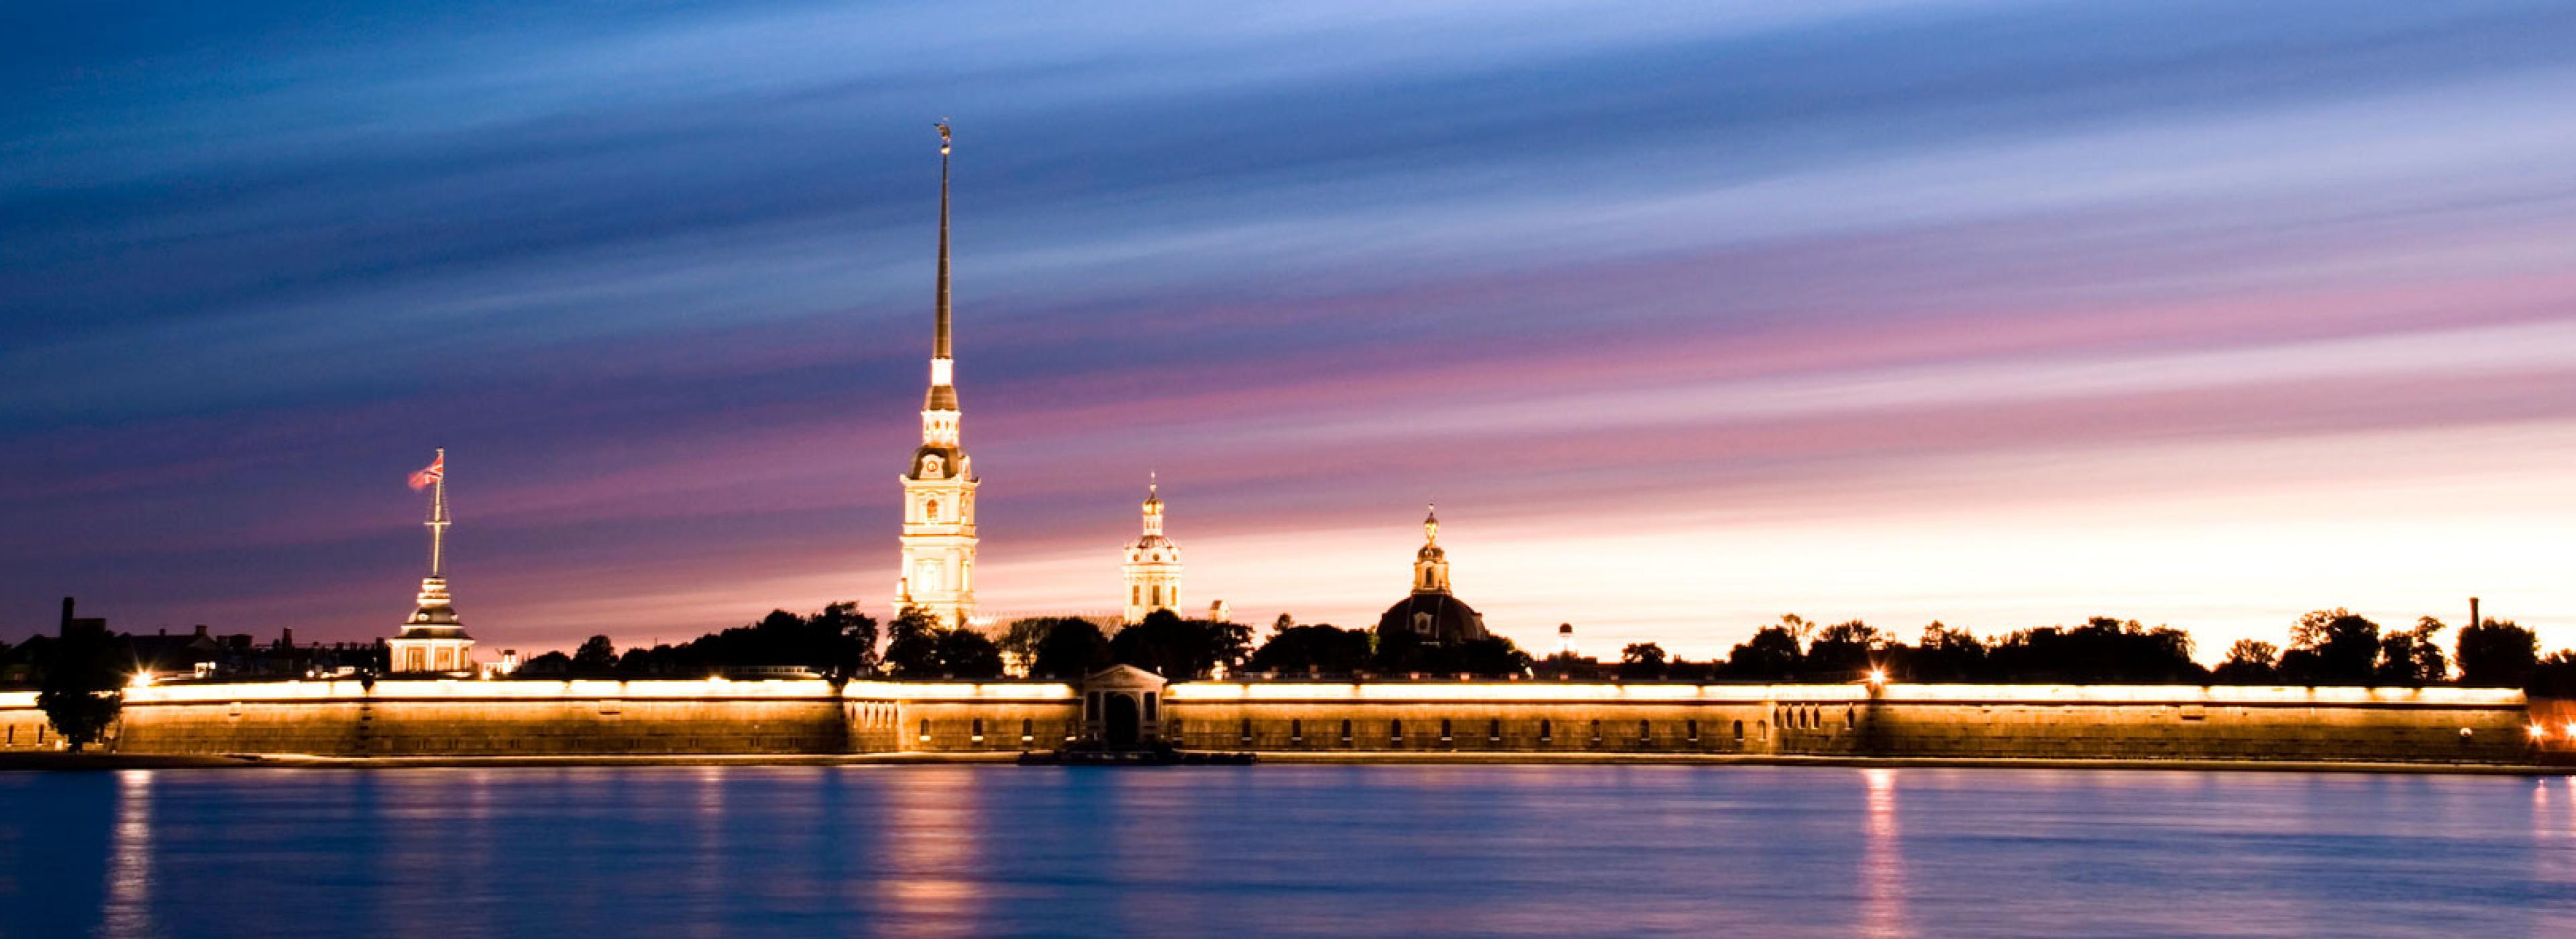 Neva River Tour Saint Petersburg